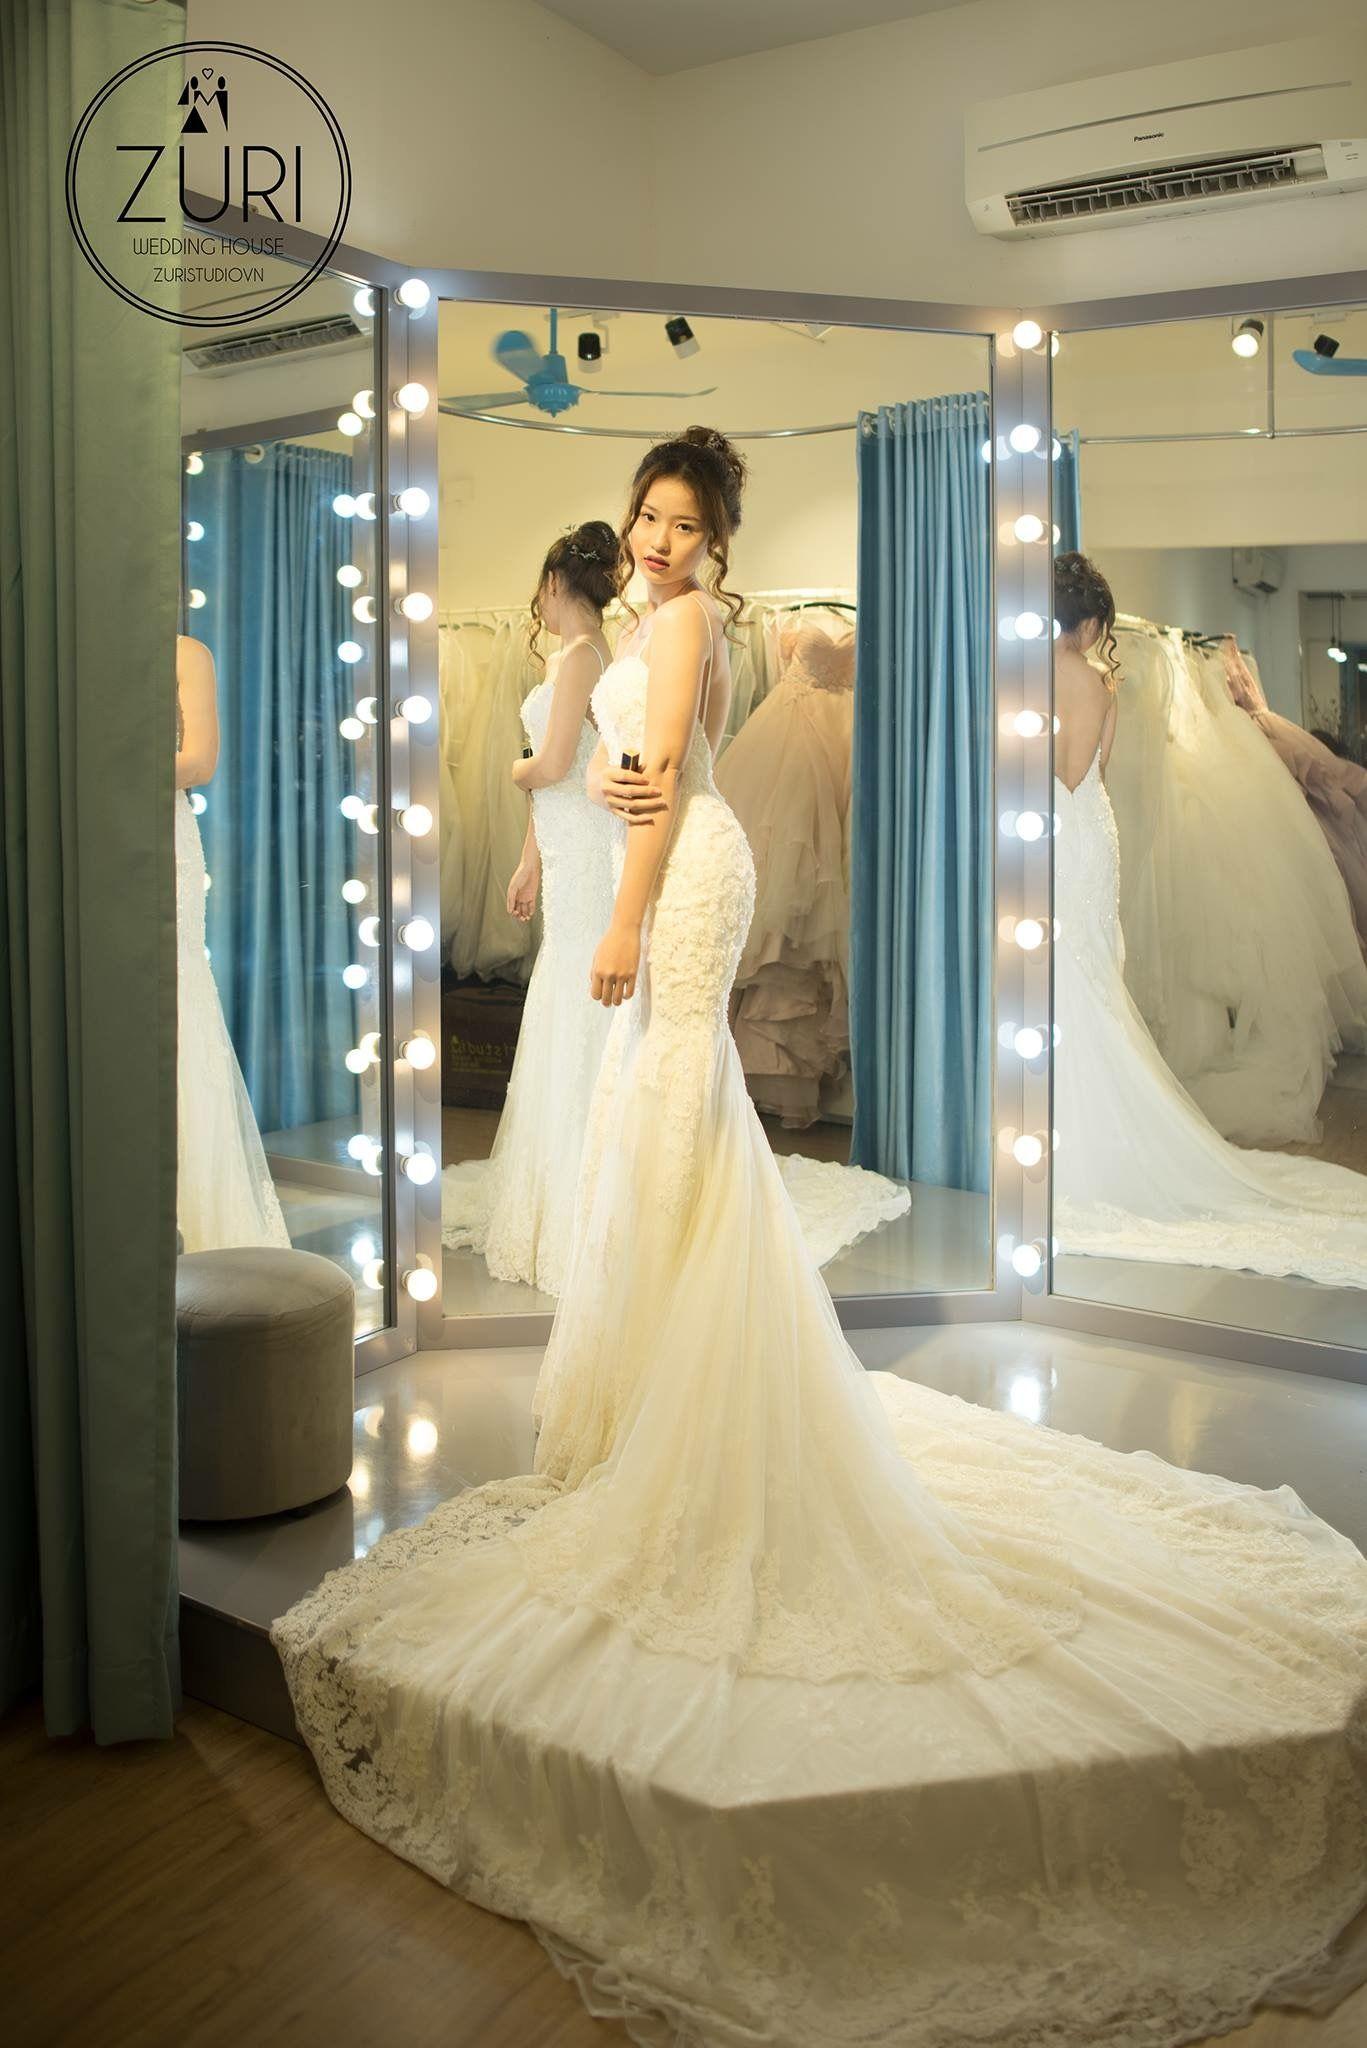 Trang Tri Cua Hang Bridal Showroom Bridal Shop Ideas Wedding Dress Store